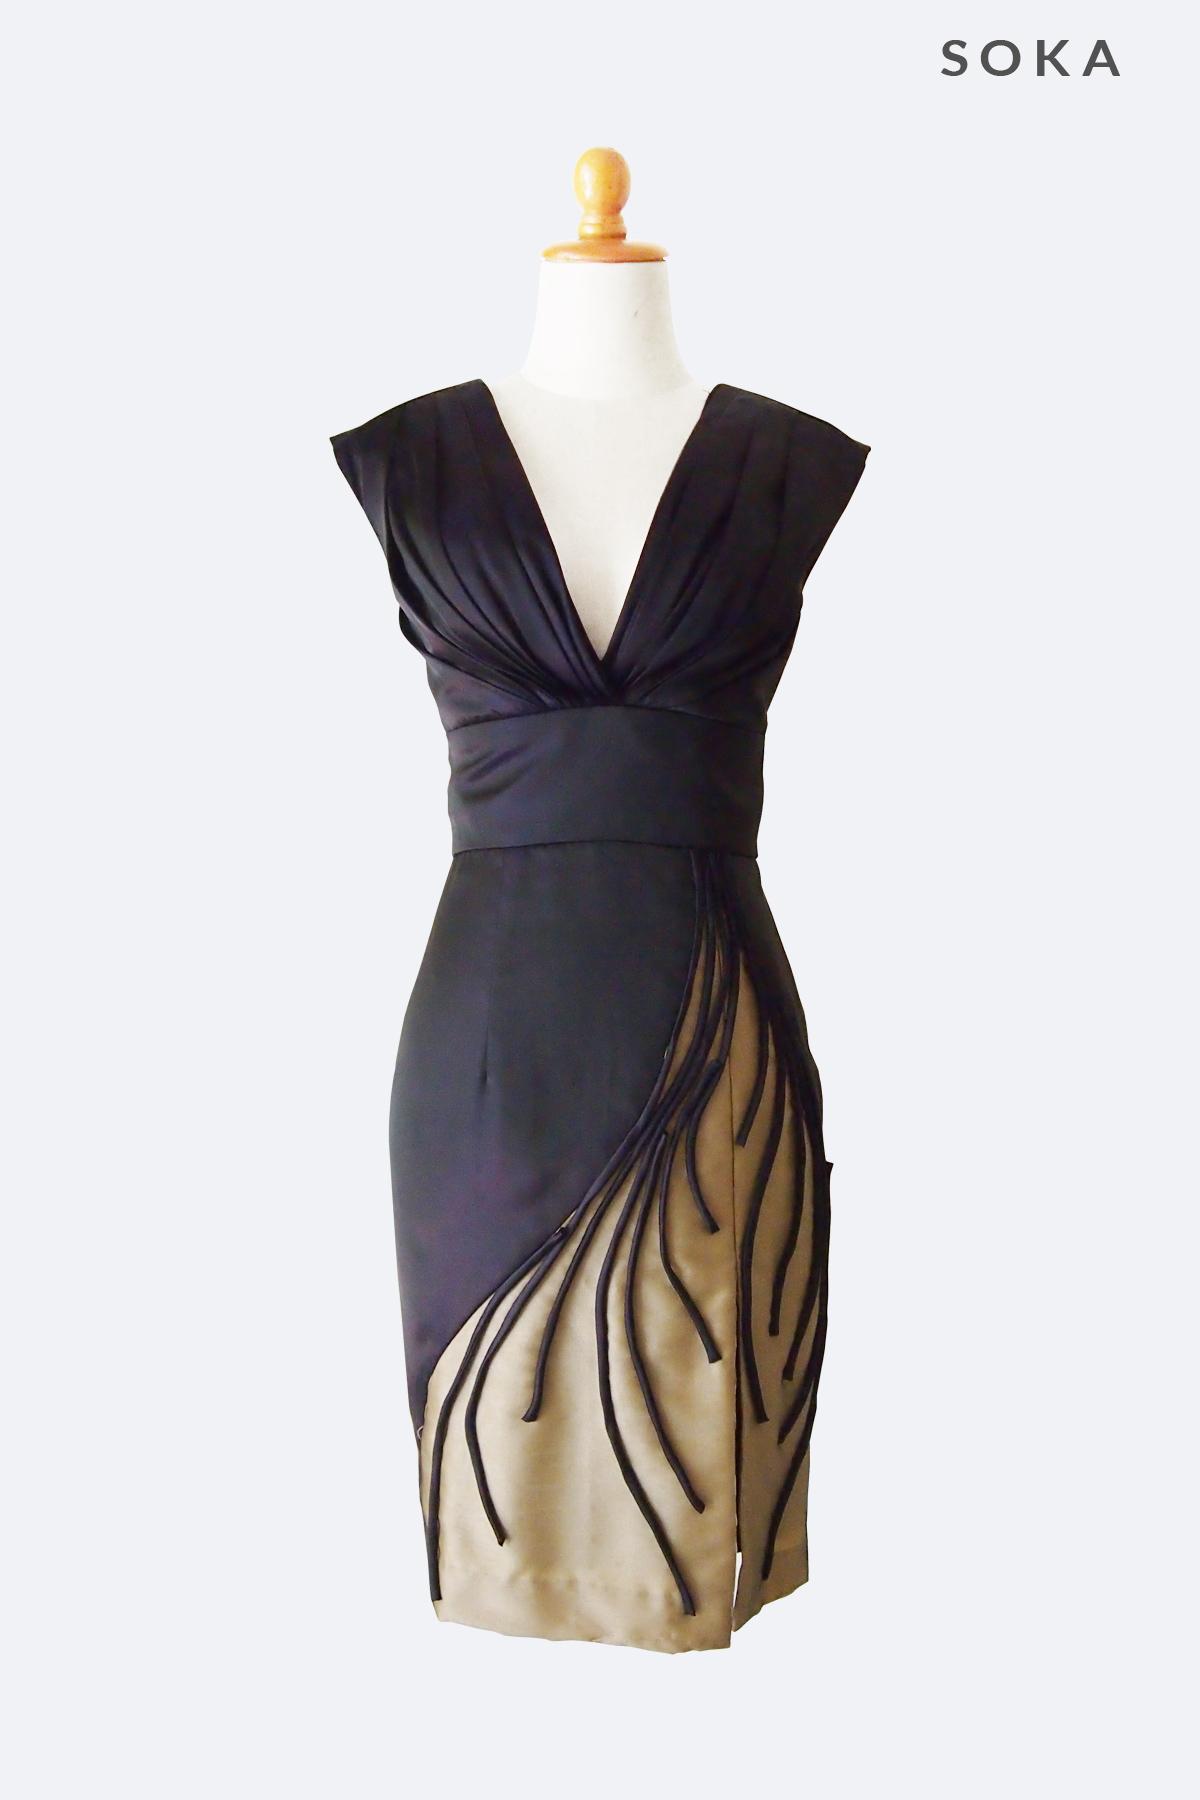 Kokolu Boutique - Australian Designer Clothing